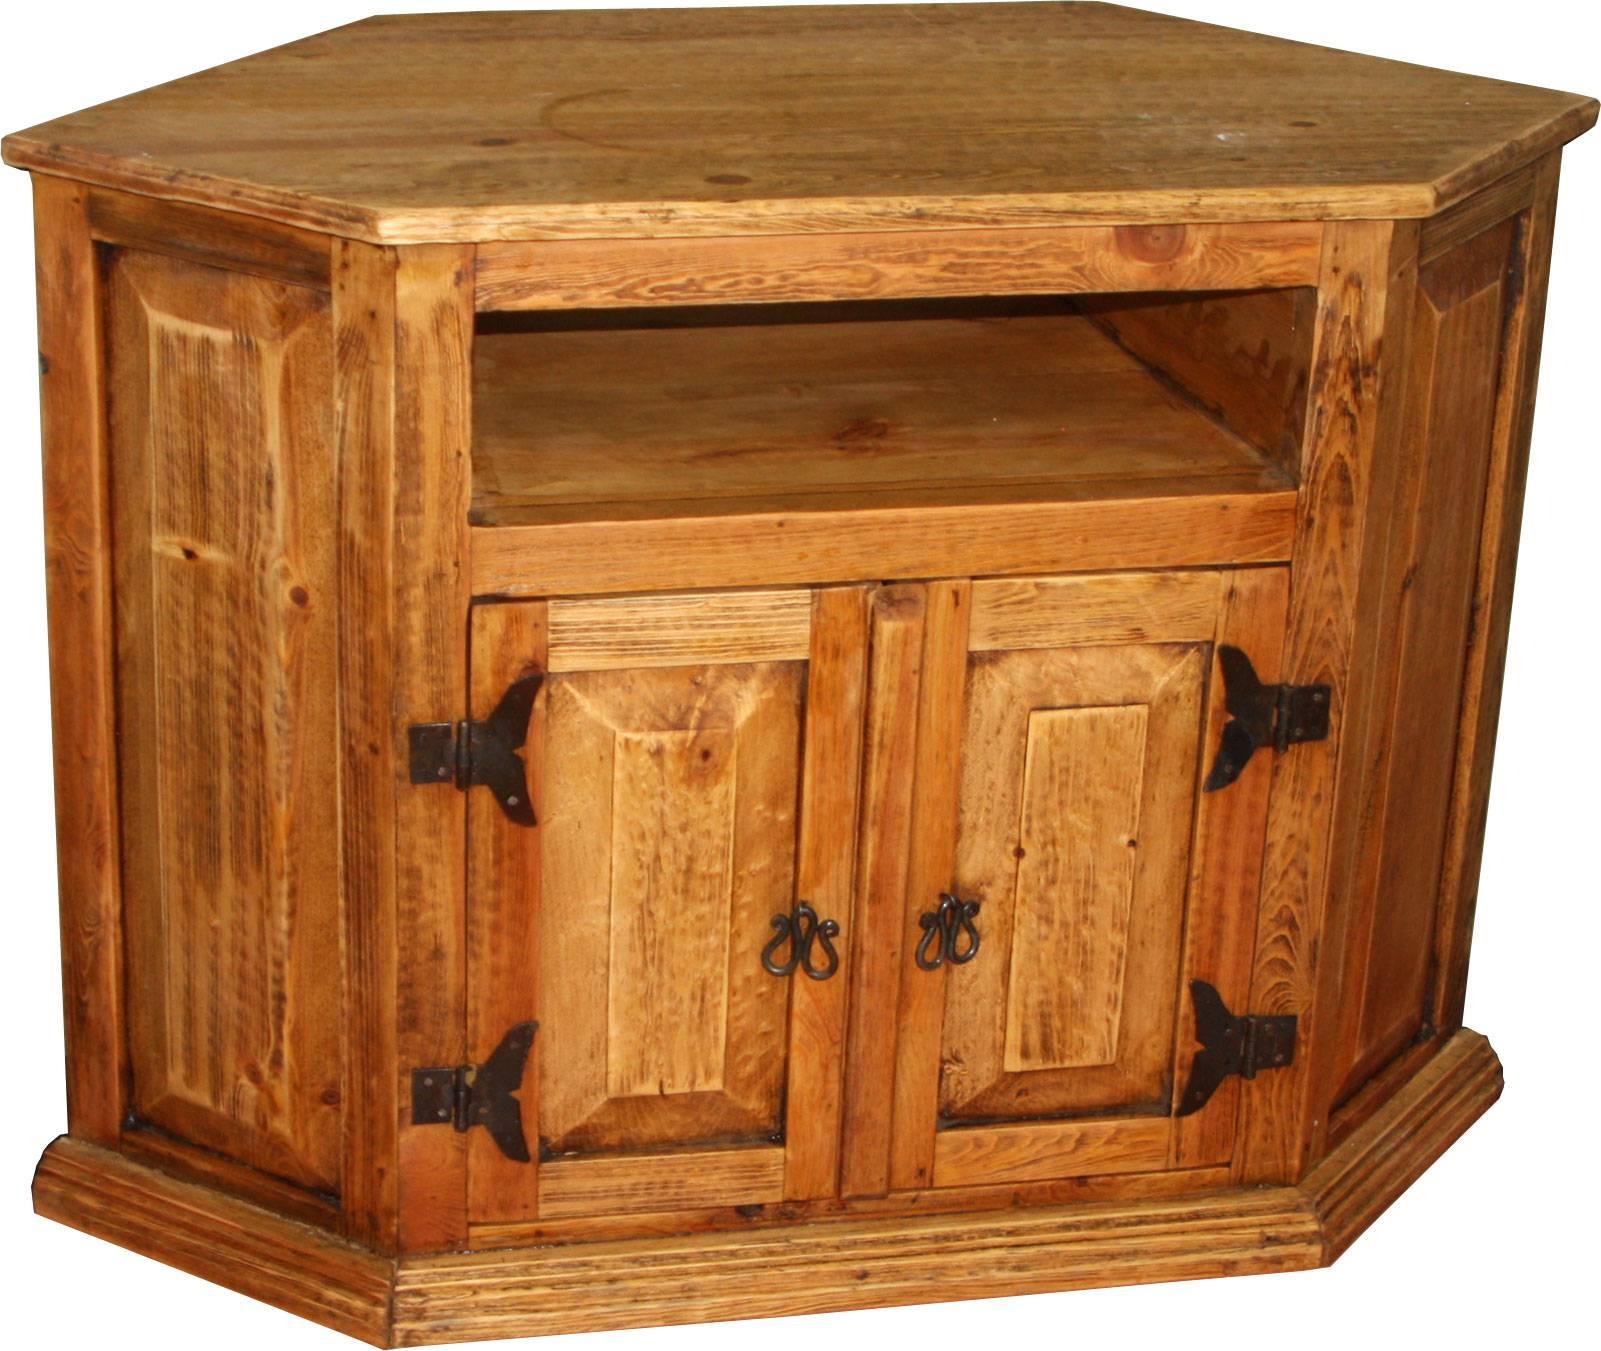 Corner Tv Stand @ Durango Trail Rustic Furniture in Rustic Corner Tv Stands (Image 4 of 15)